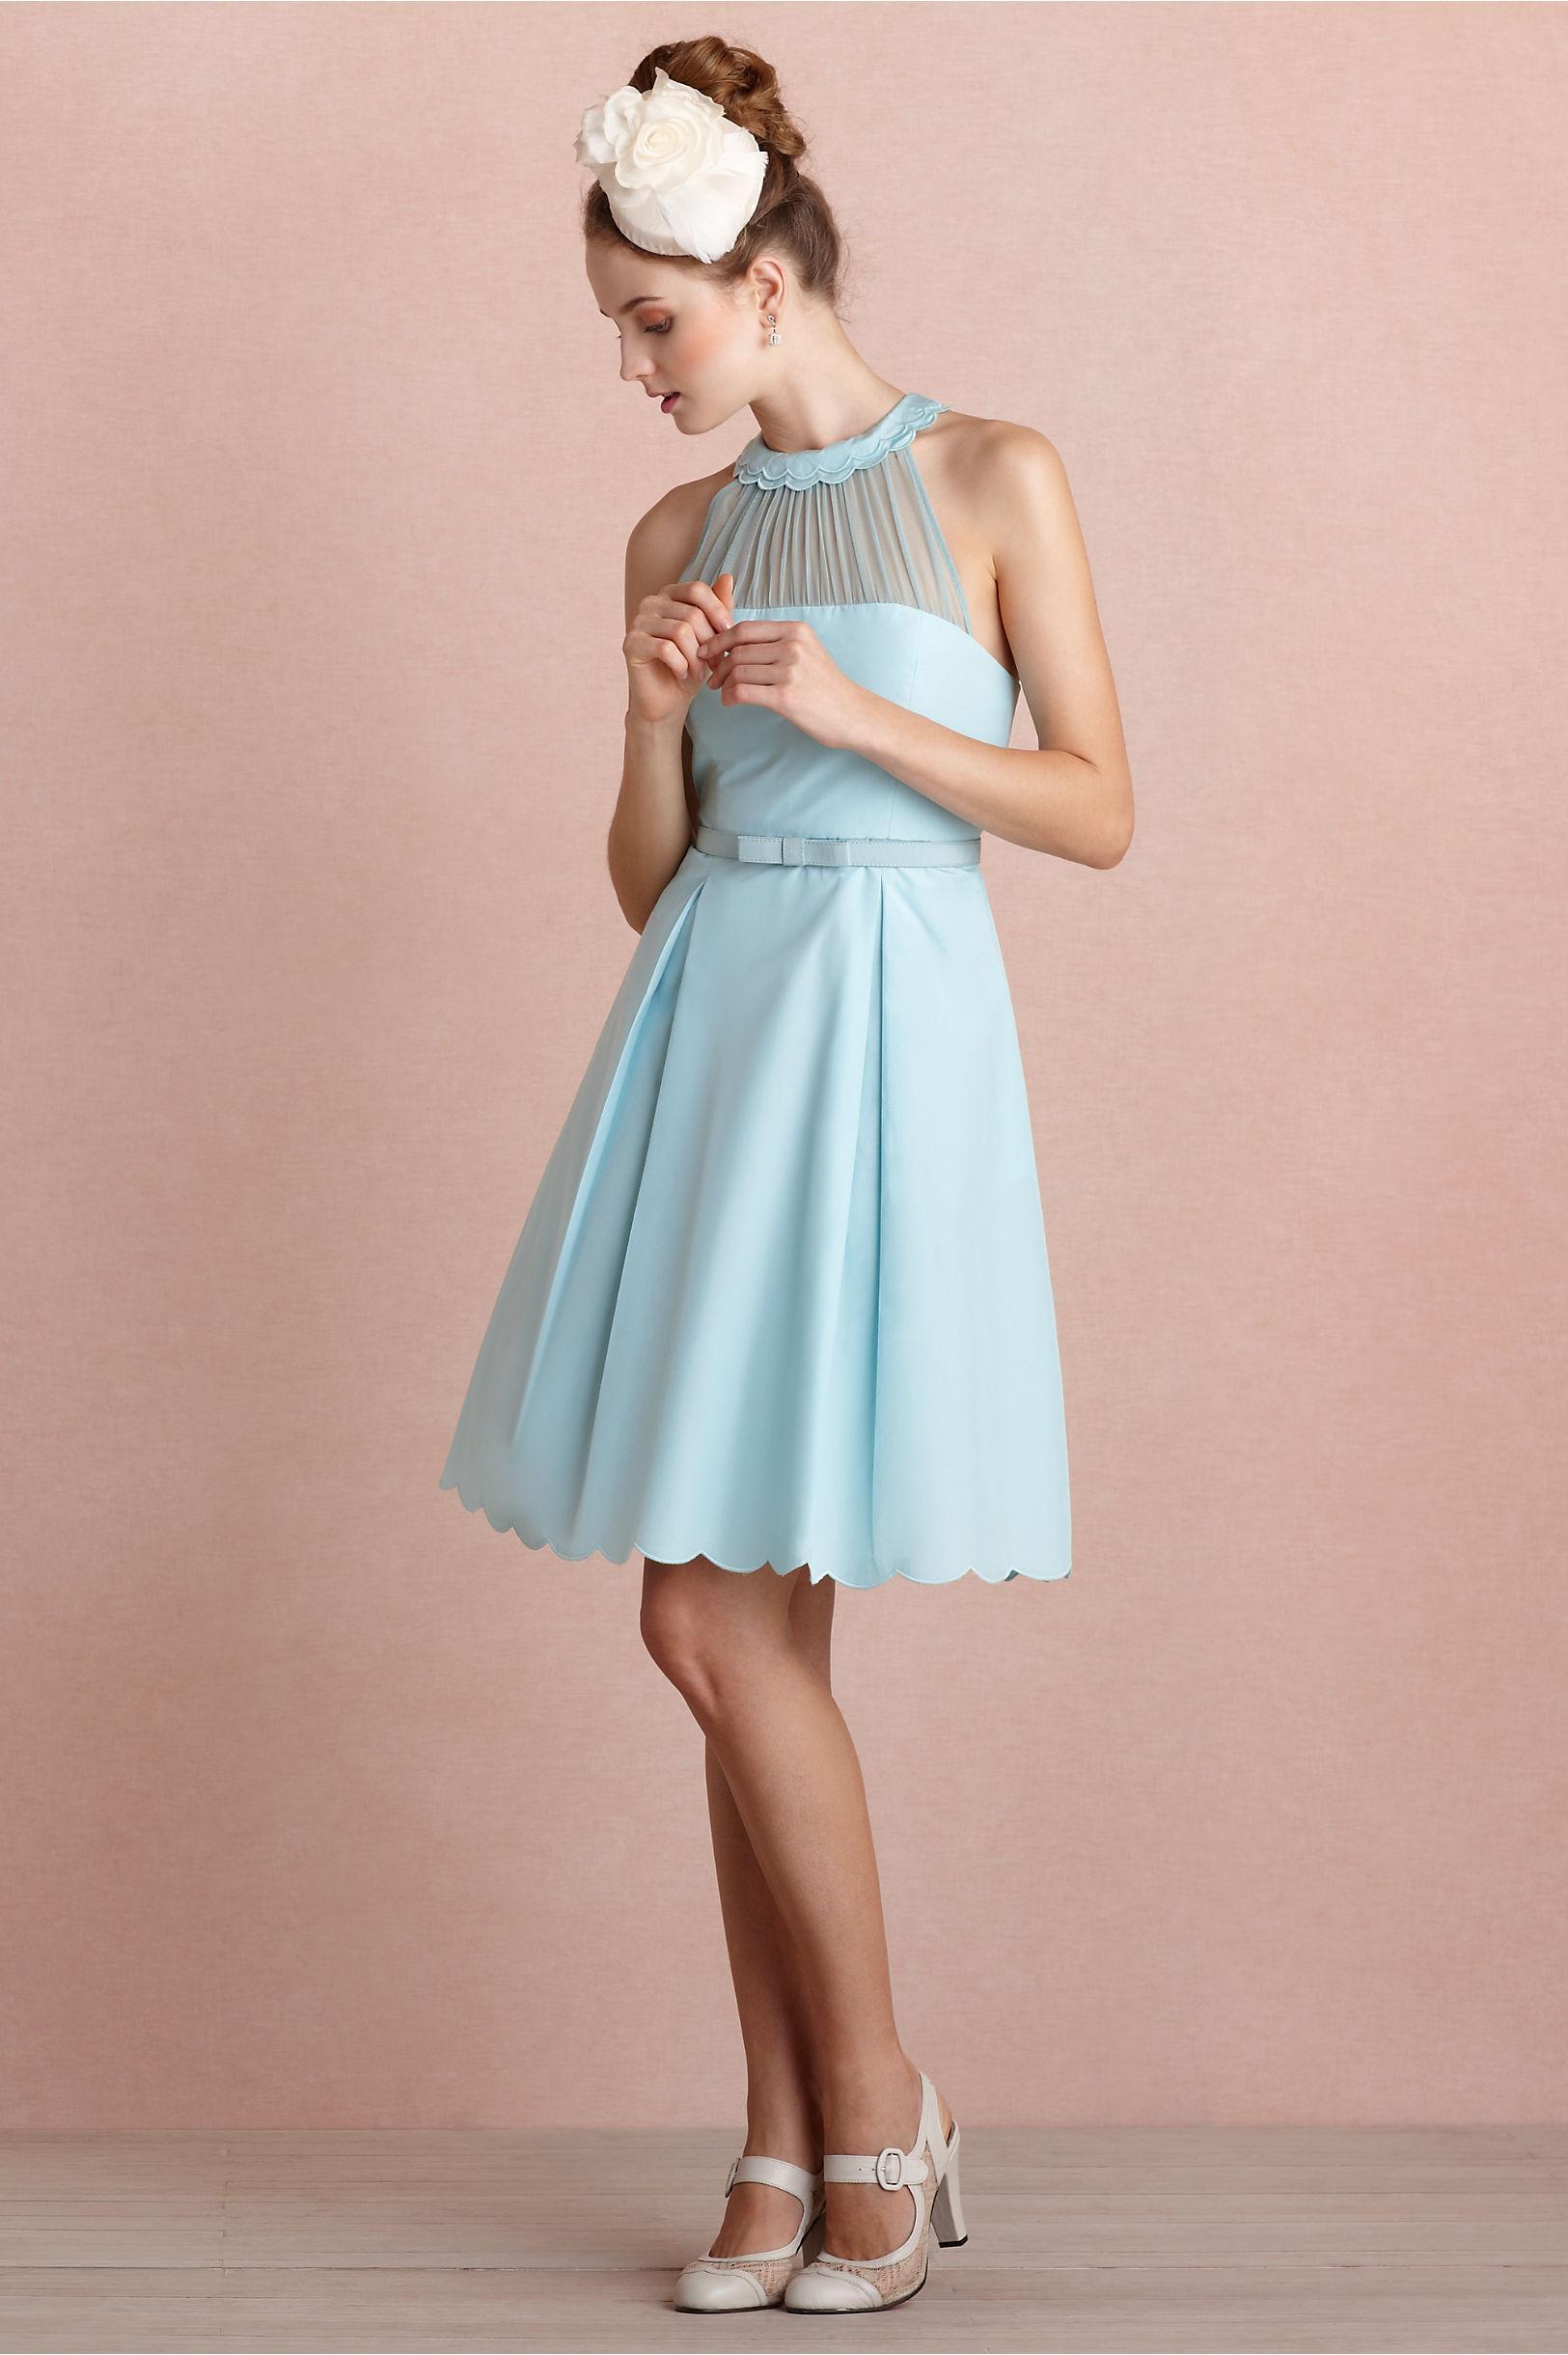 Horizon Dress in Bridal Party | BHLDN